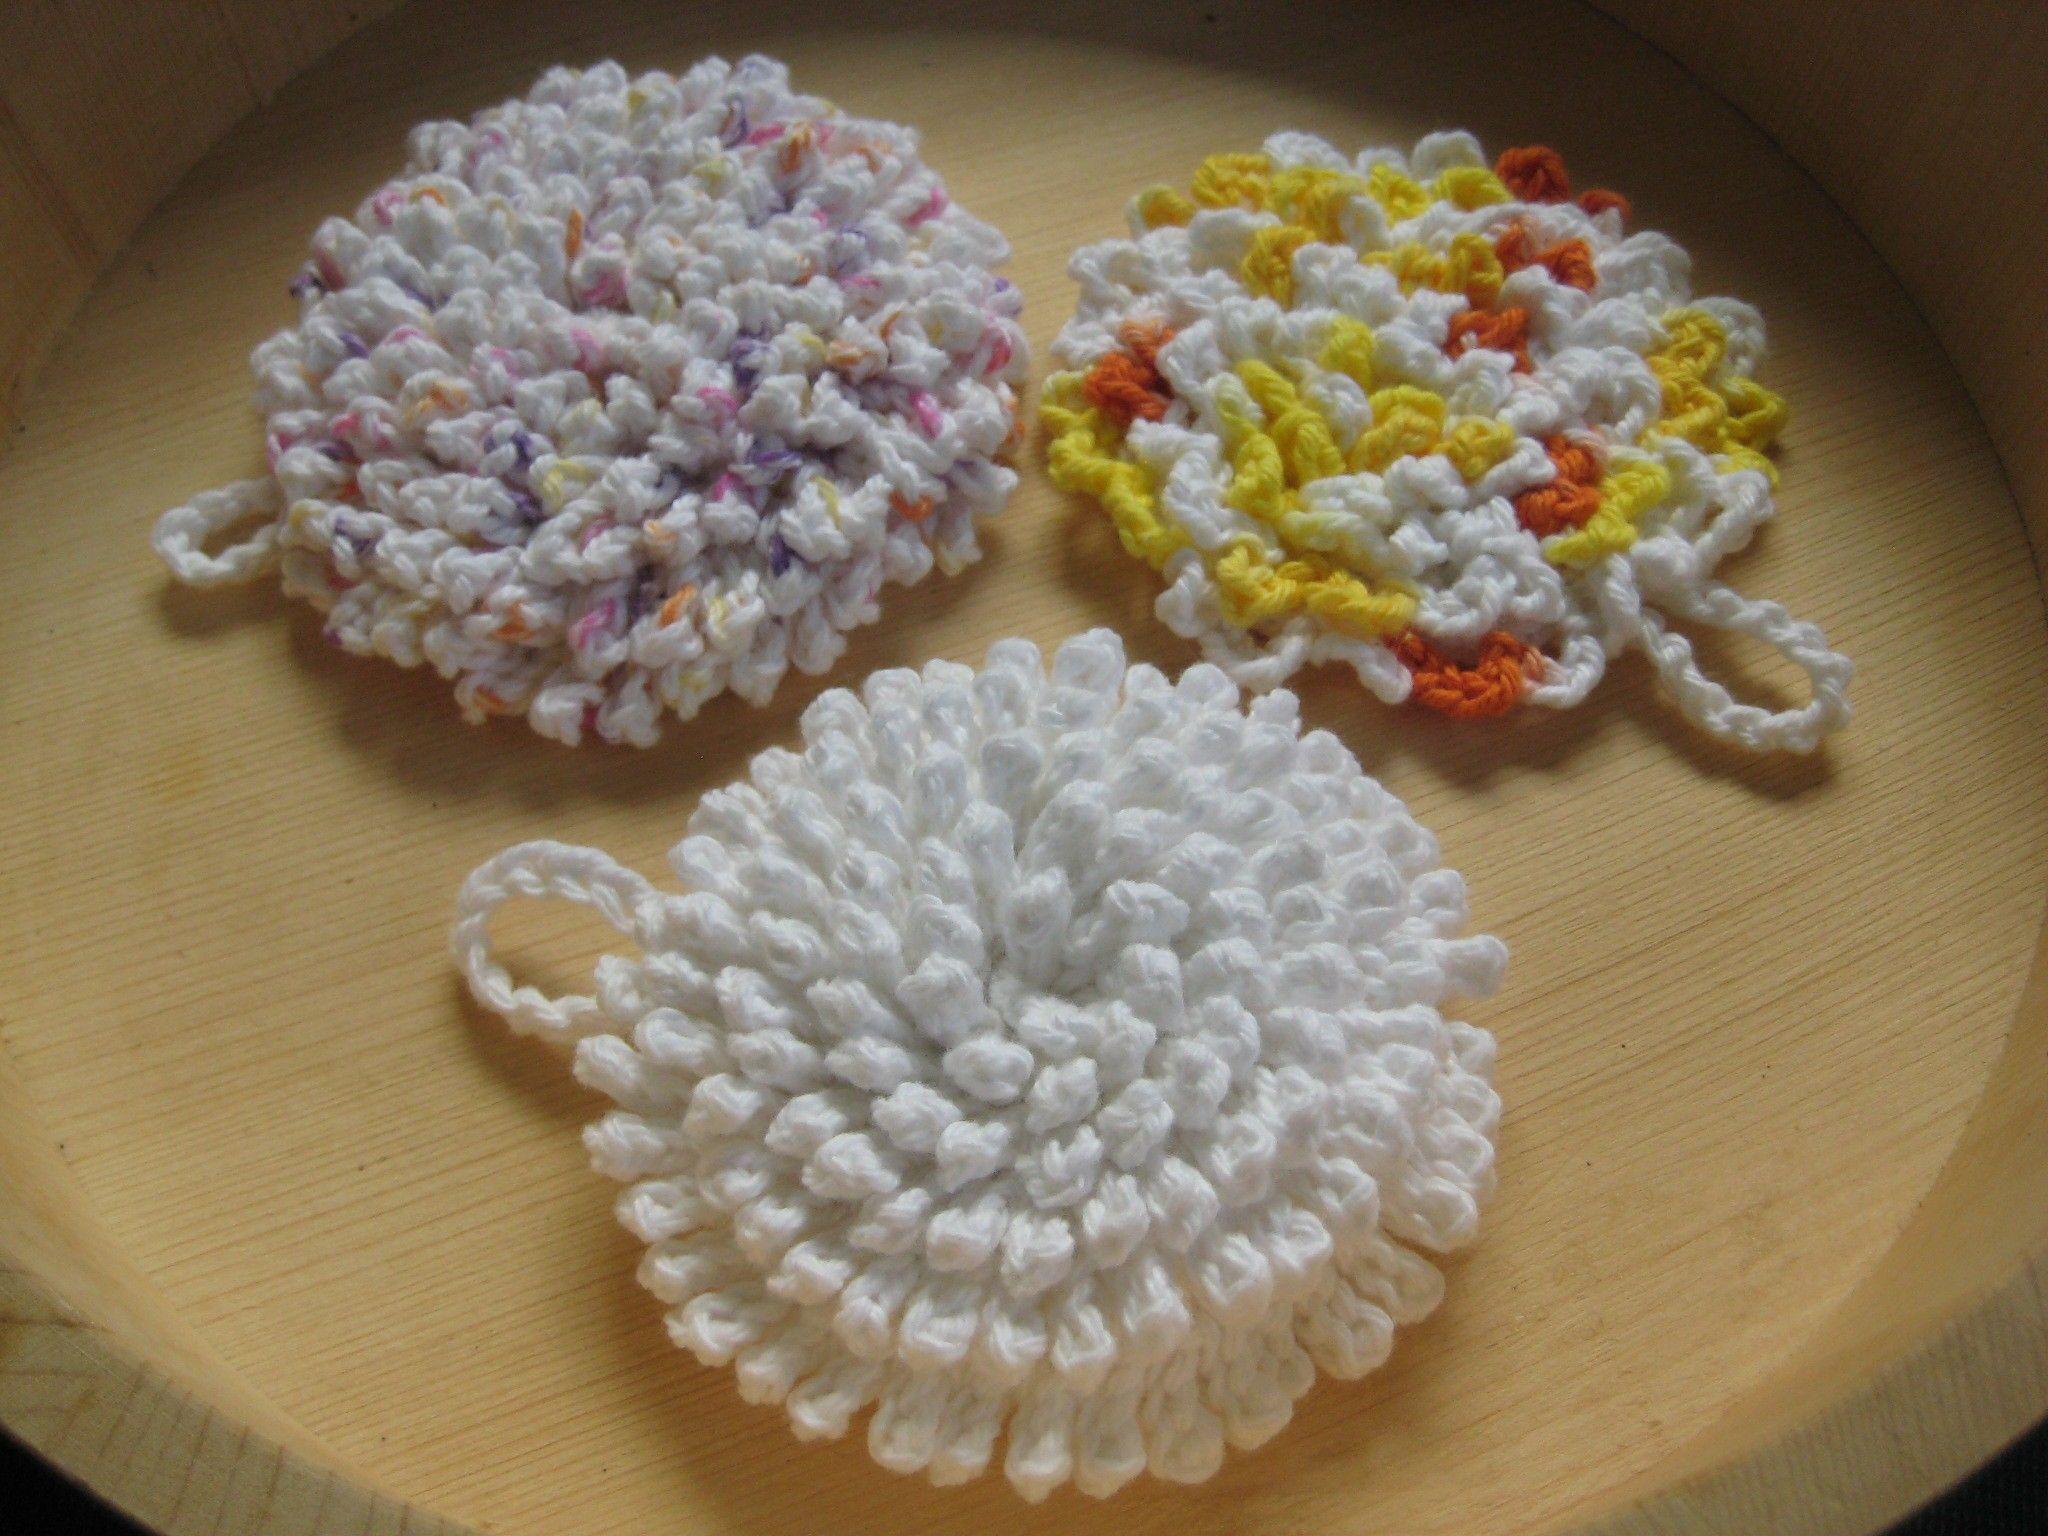 Ultra nubby scrubby tawashi crochet dish cloth pattern | Crochet ...